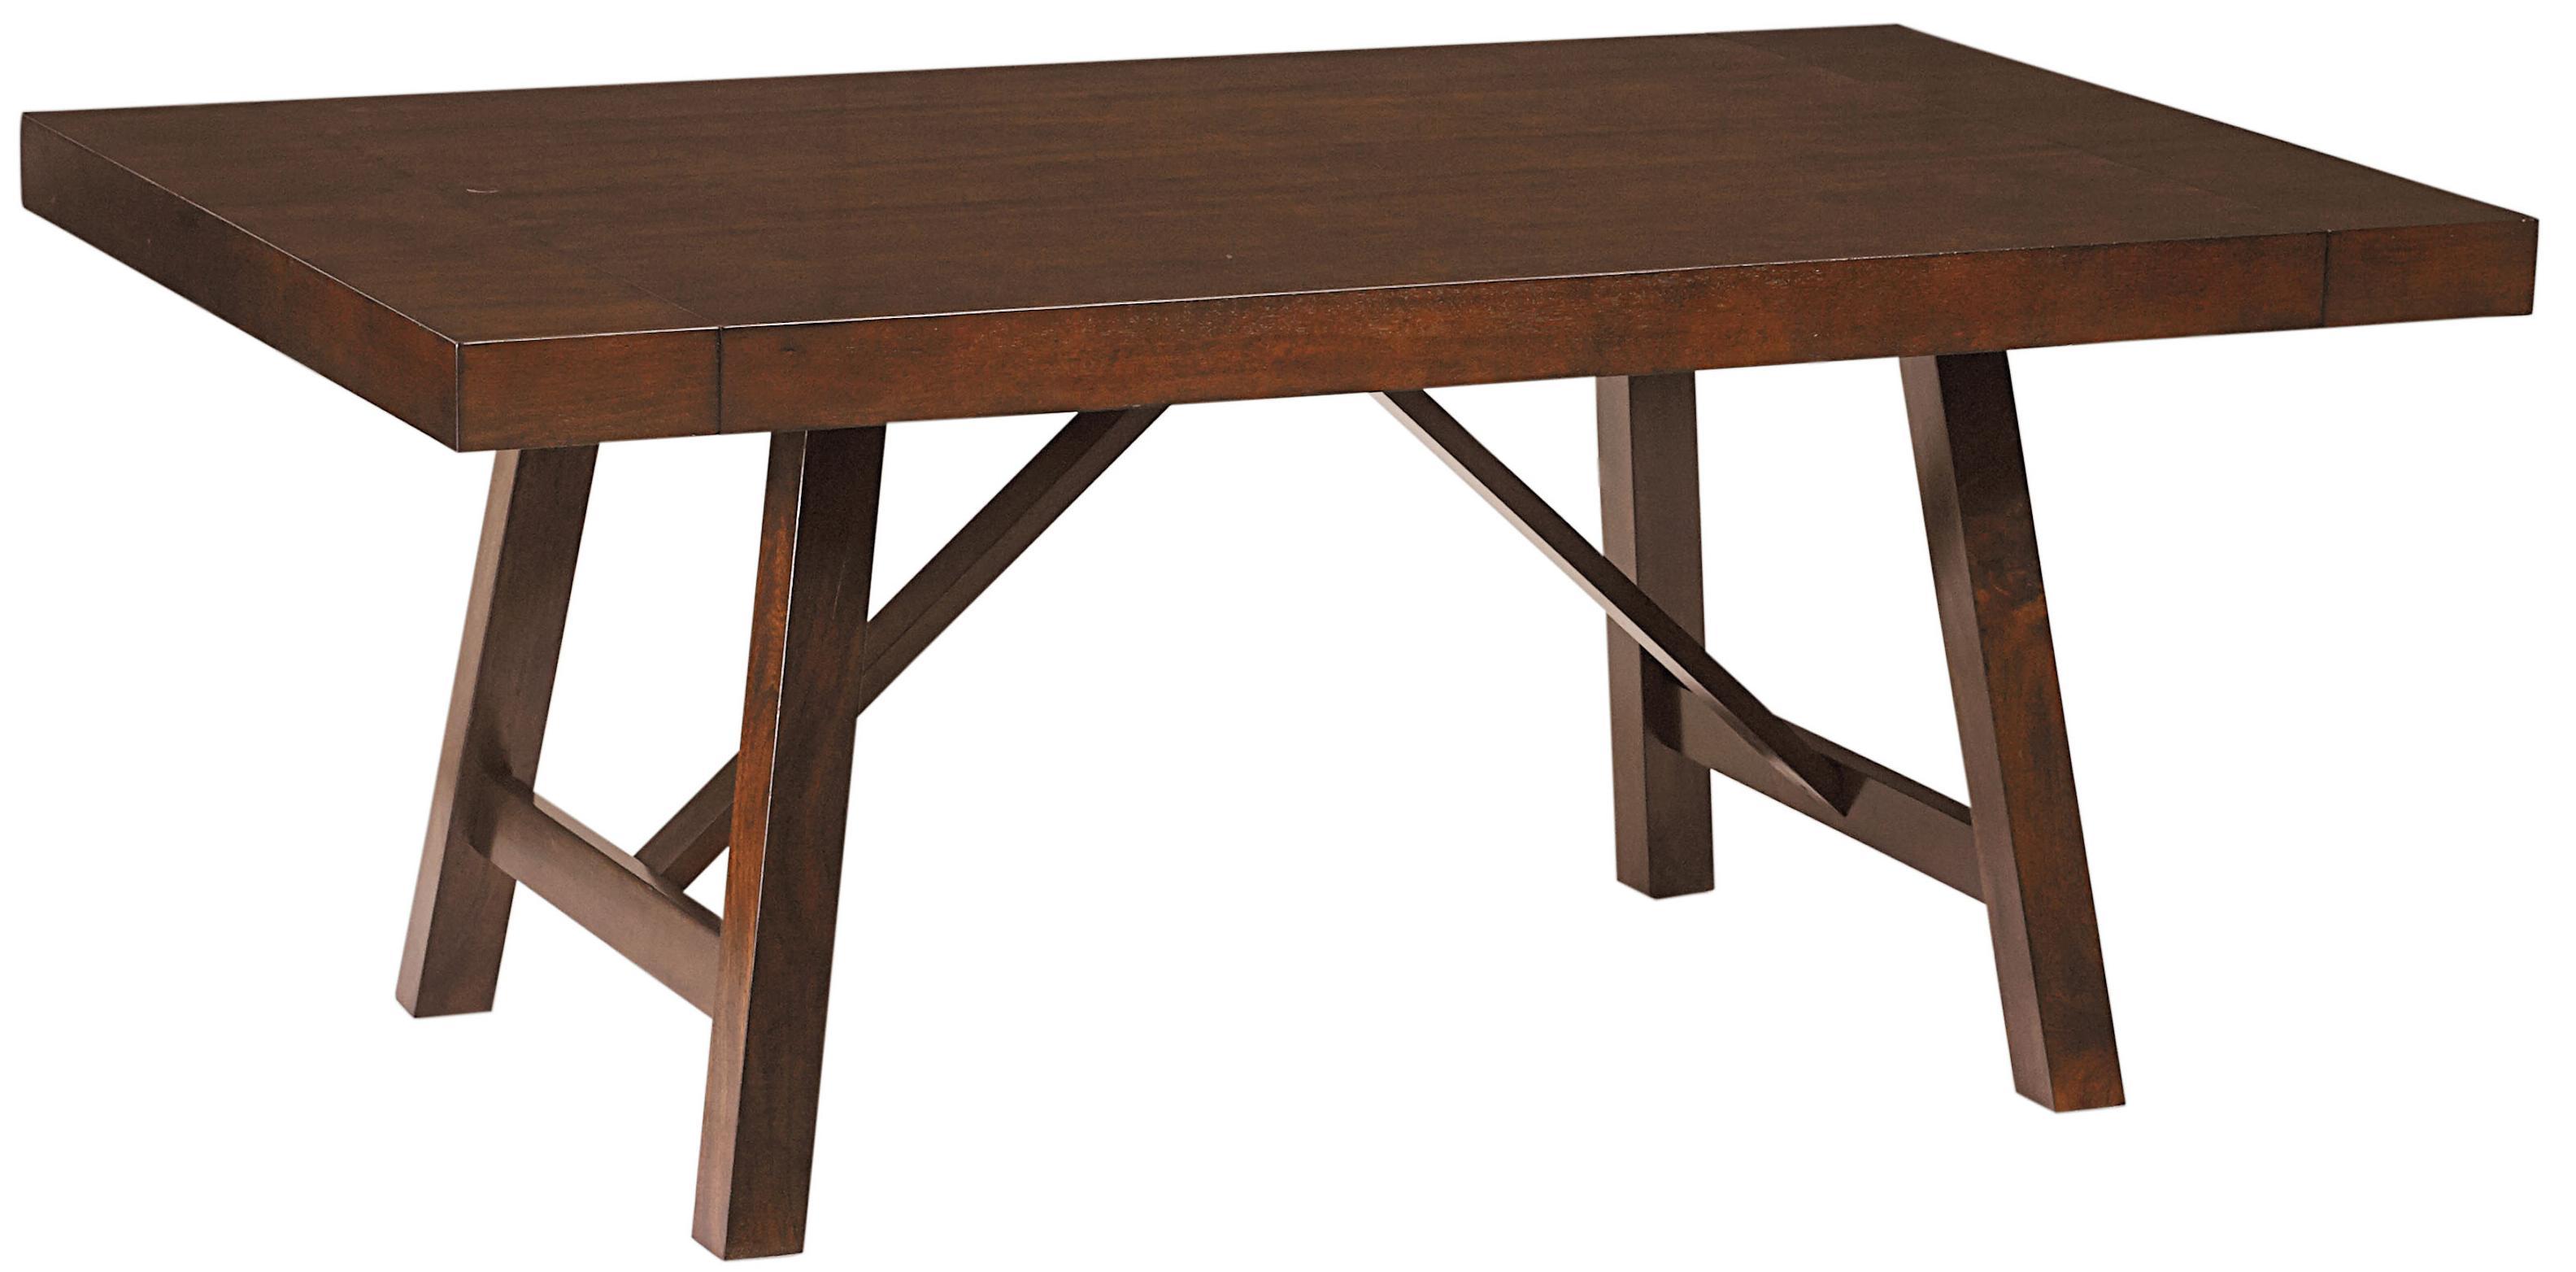 Standard furniture omaha brown 16181 trestle dining room for Table standard